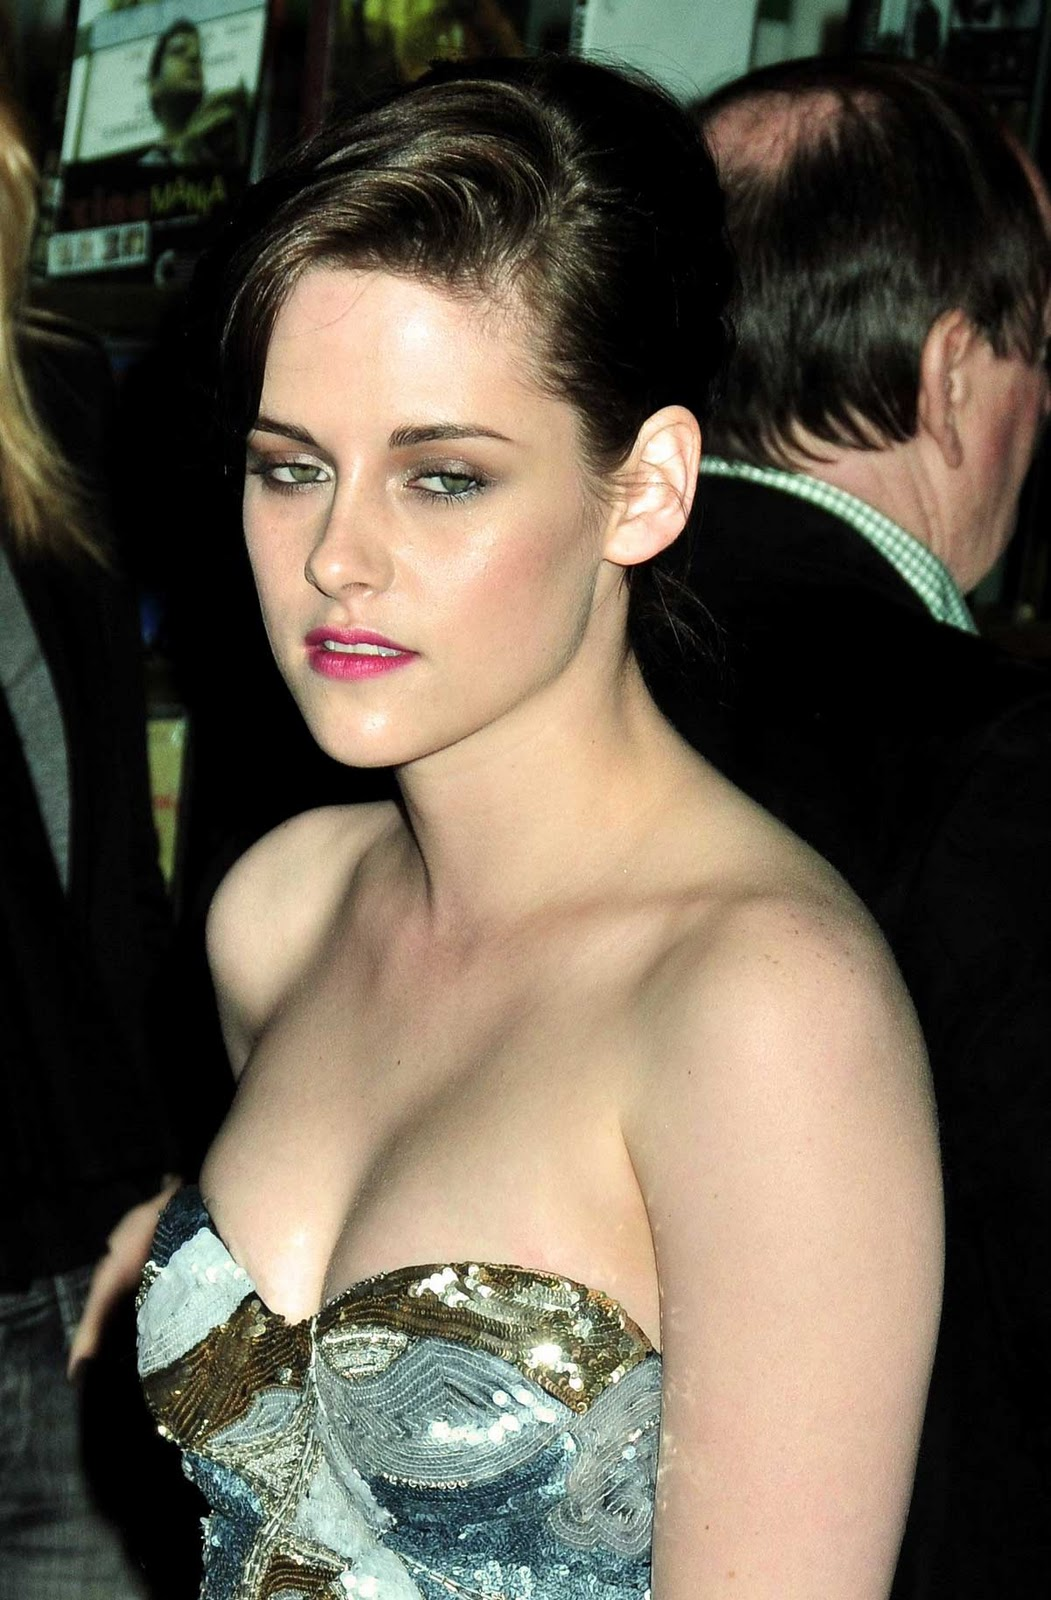 Cleavage Kristen Stewart naked (92 photos), Tits, Sideboobs, Boobs, in bikini 2006